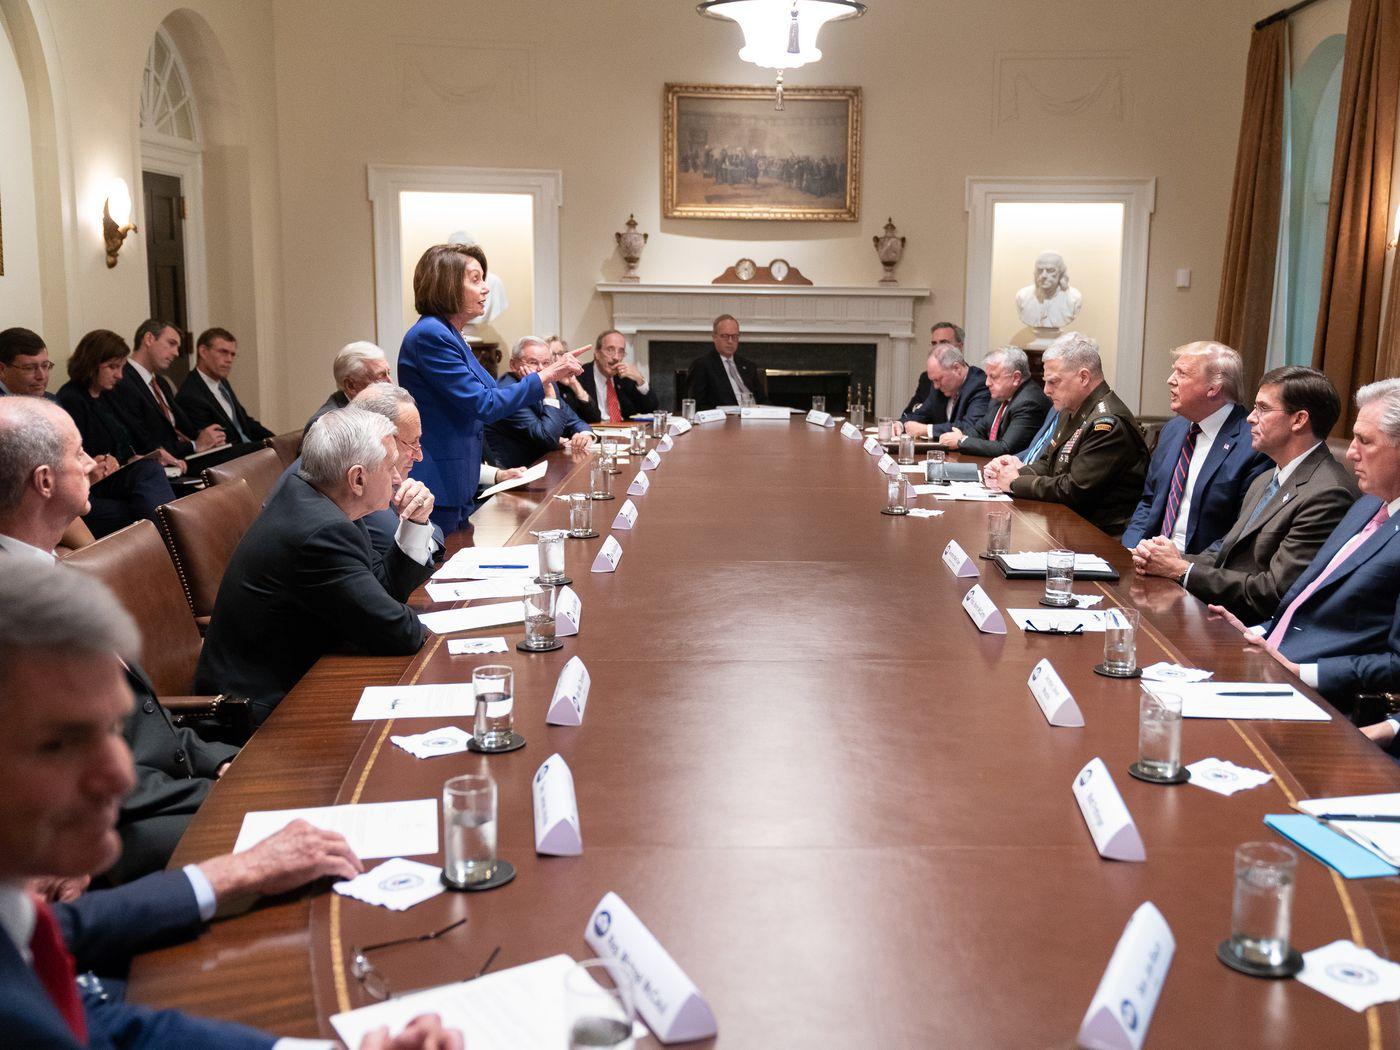 Trump S Nervous Nancy Photo Shows His Problem With